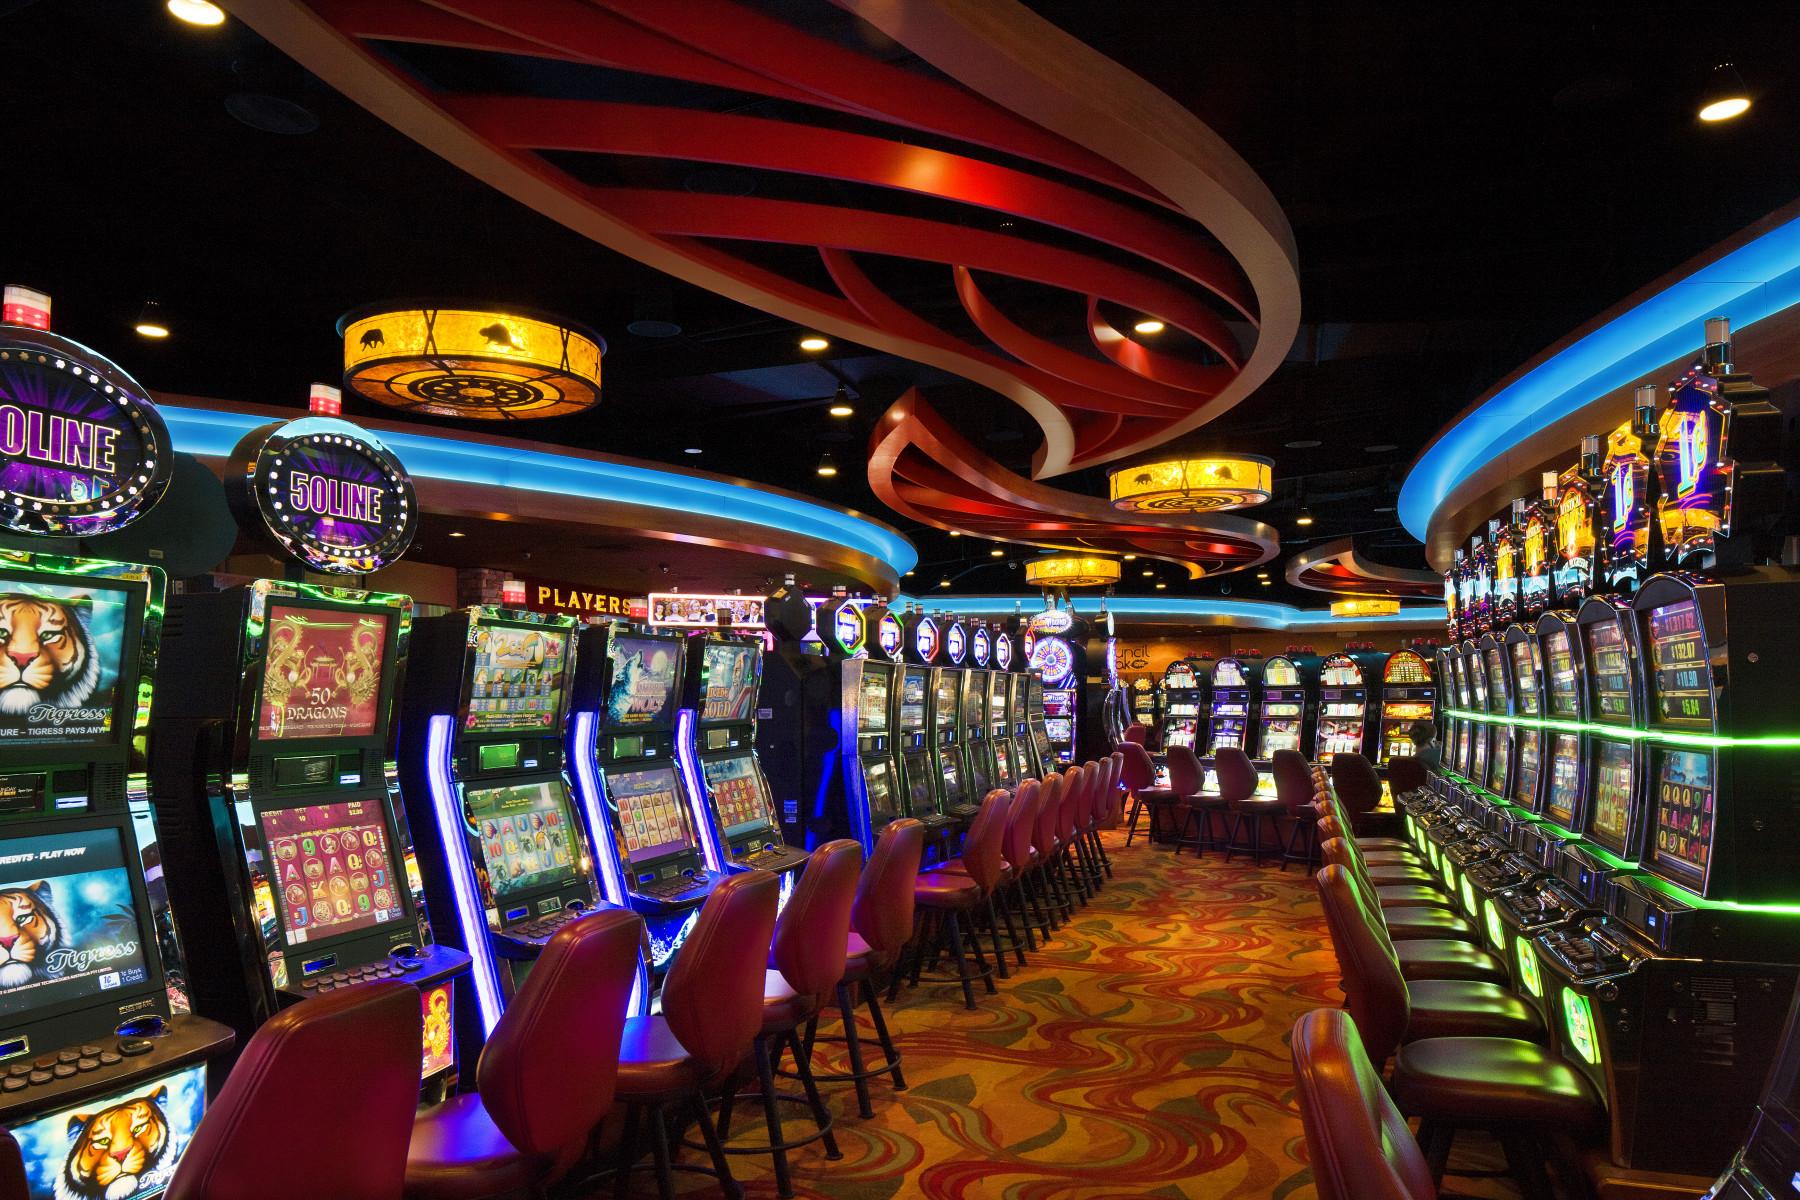 Lincecia de Gaming Club casino online Madrid 270370